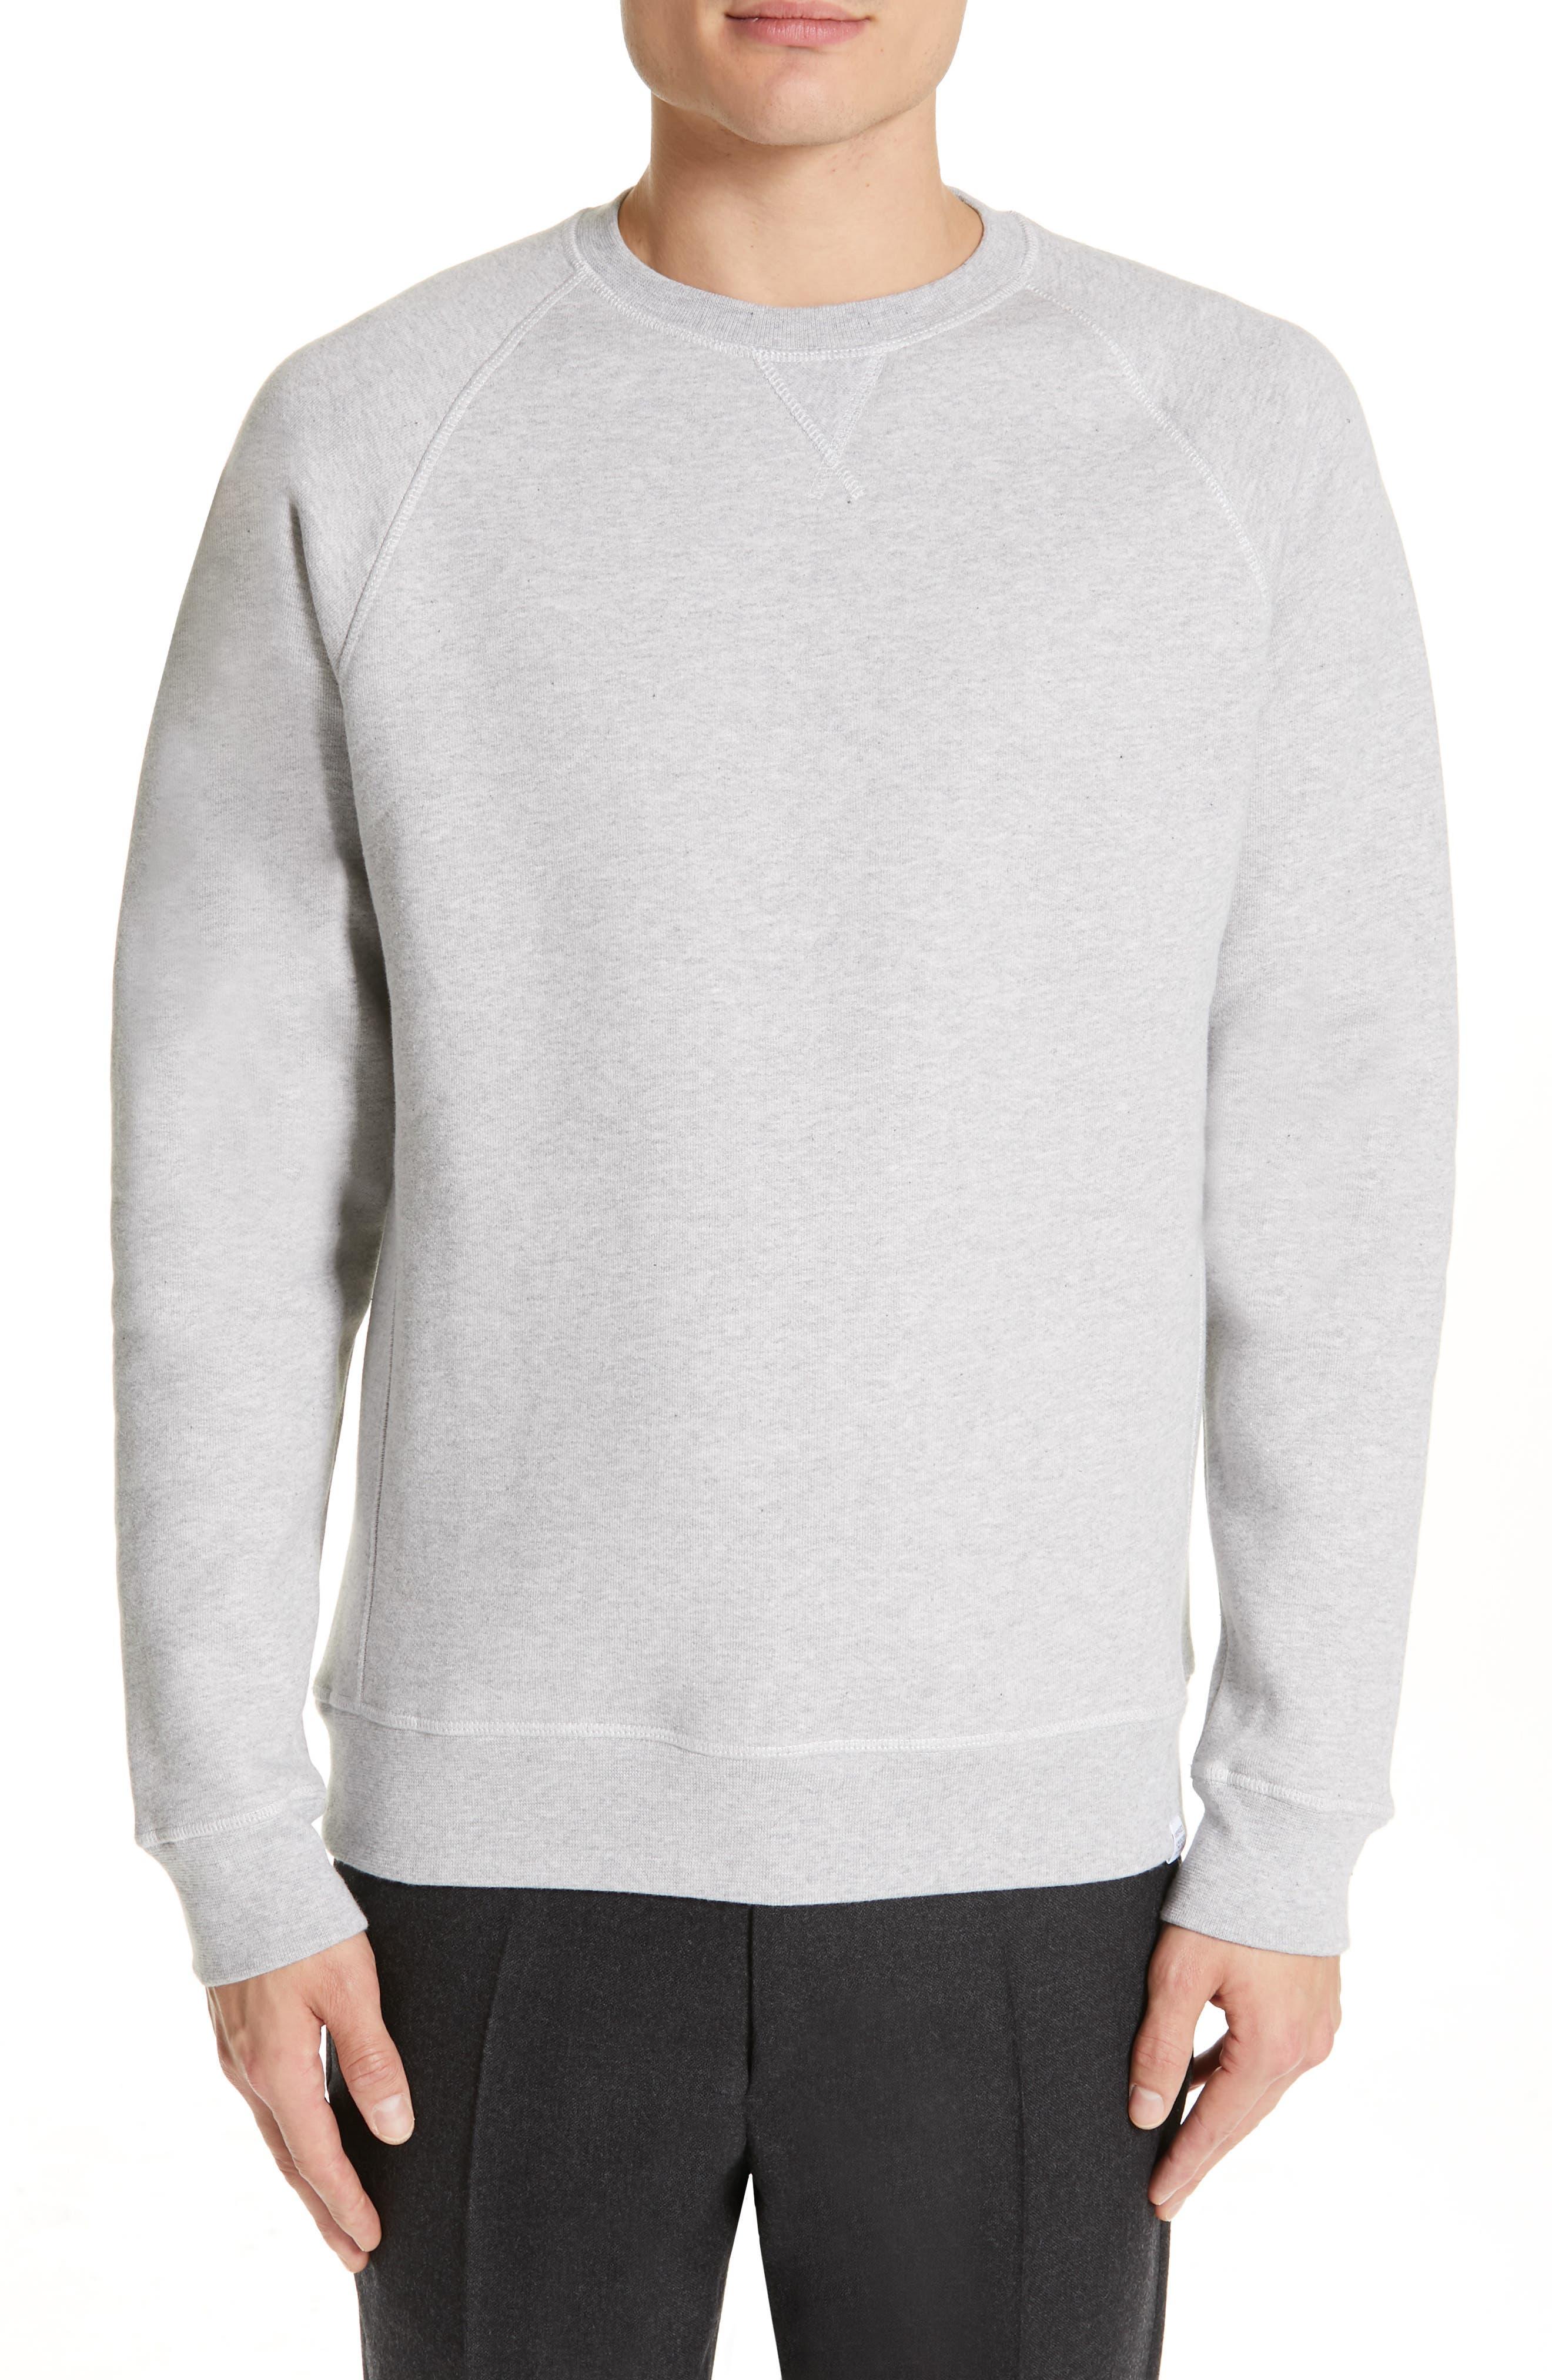 NORSE PROJECTS, Ketel Raglan Sweatshirt, Main thumbnail 1, color, LIGHT GREY MELANGE